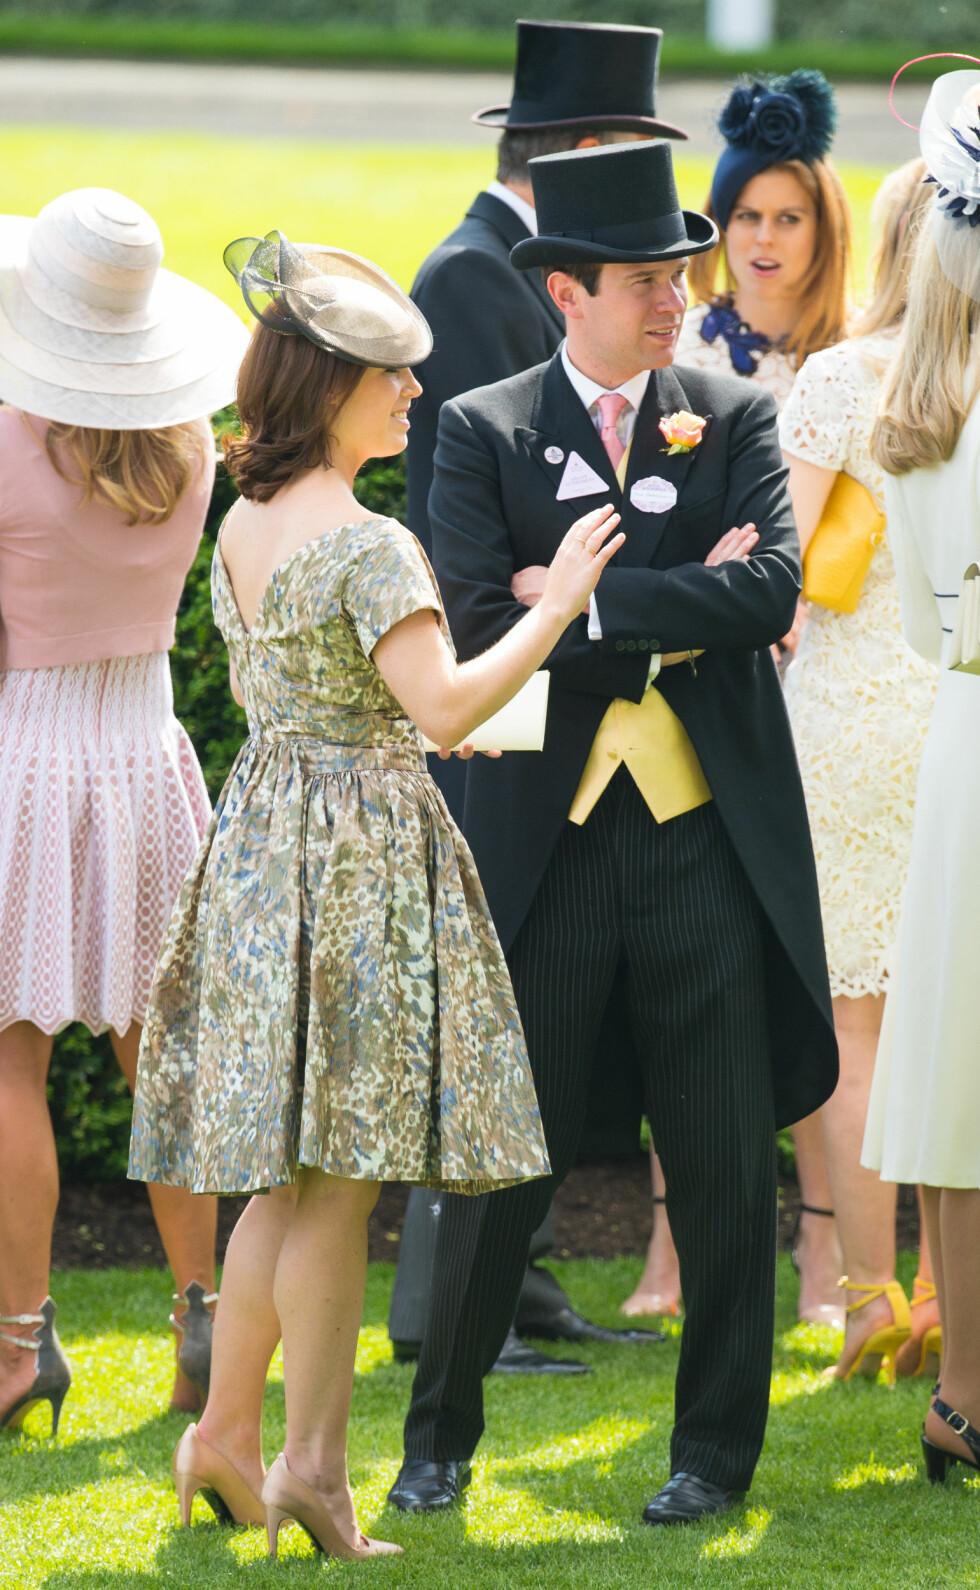 I DE ROYALE KRETSER: Prinsesse Eugenie er den åttende i rekken til den britiske tronen. Foto: NTB Scanpix